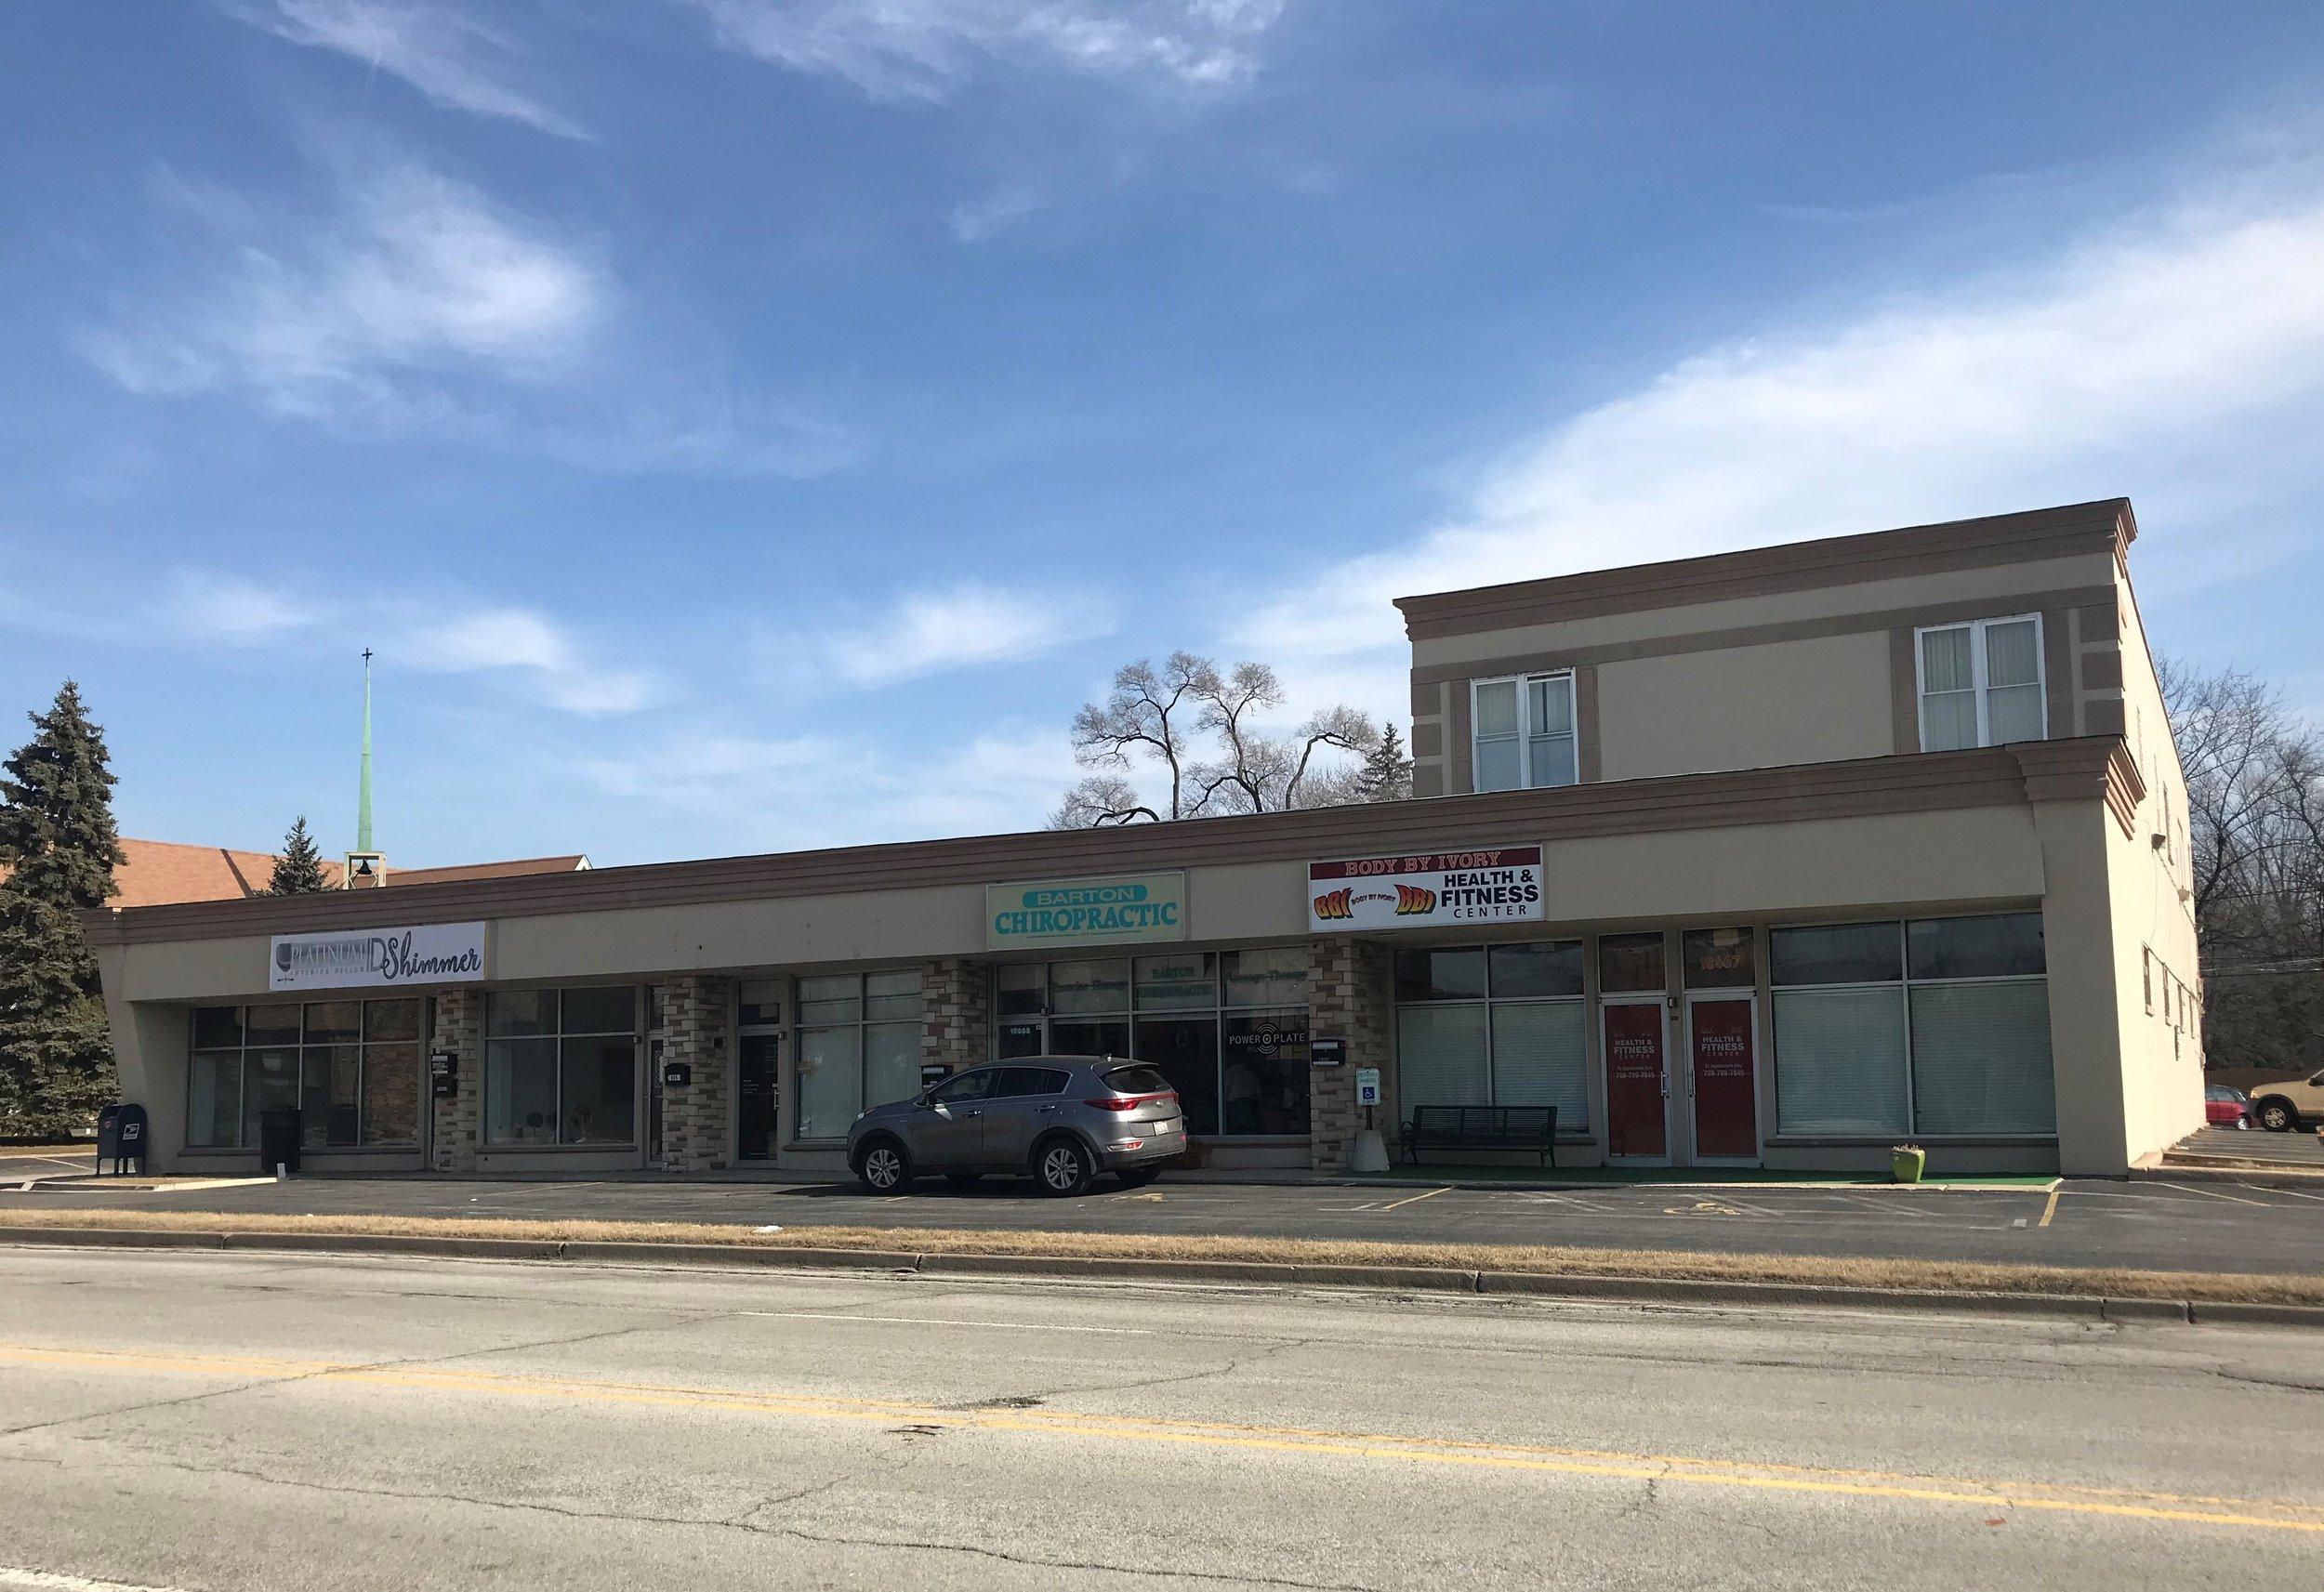 Retail/Apartment Building - Location: Homewood, ILPrice: $949,000Comments: 5-retail stores .. 2-apartment units